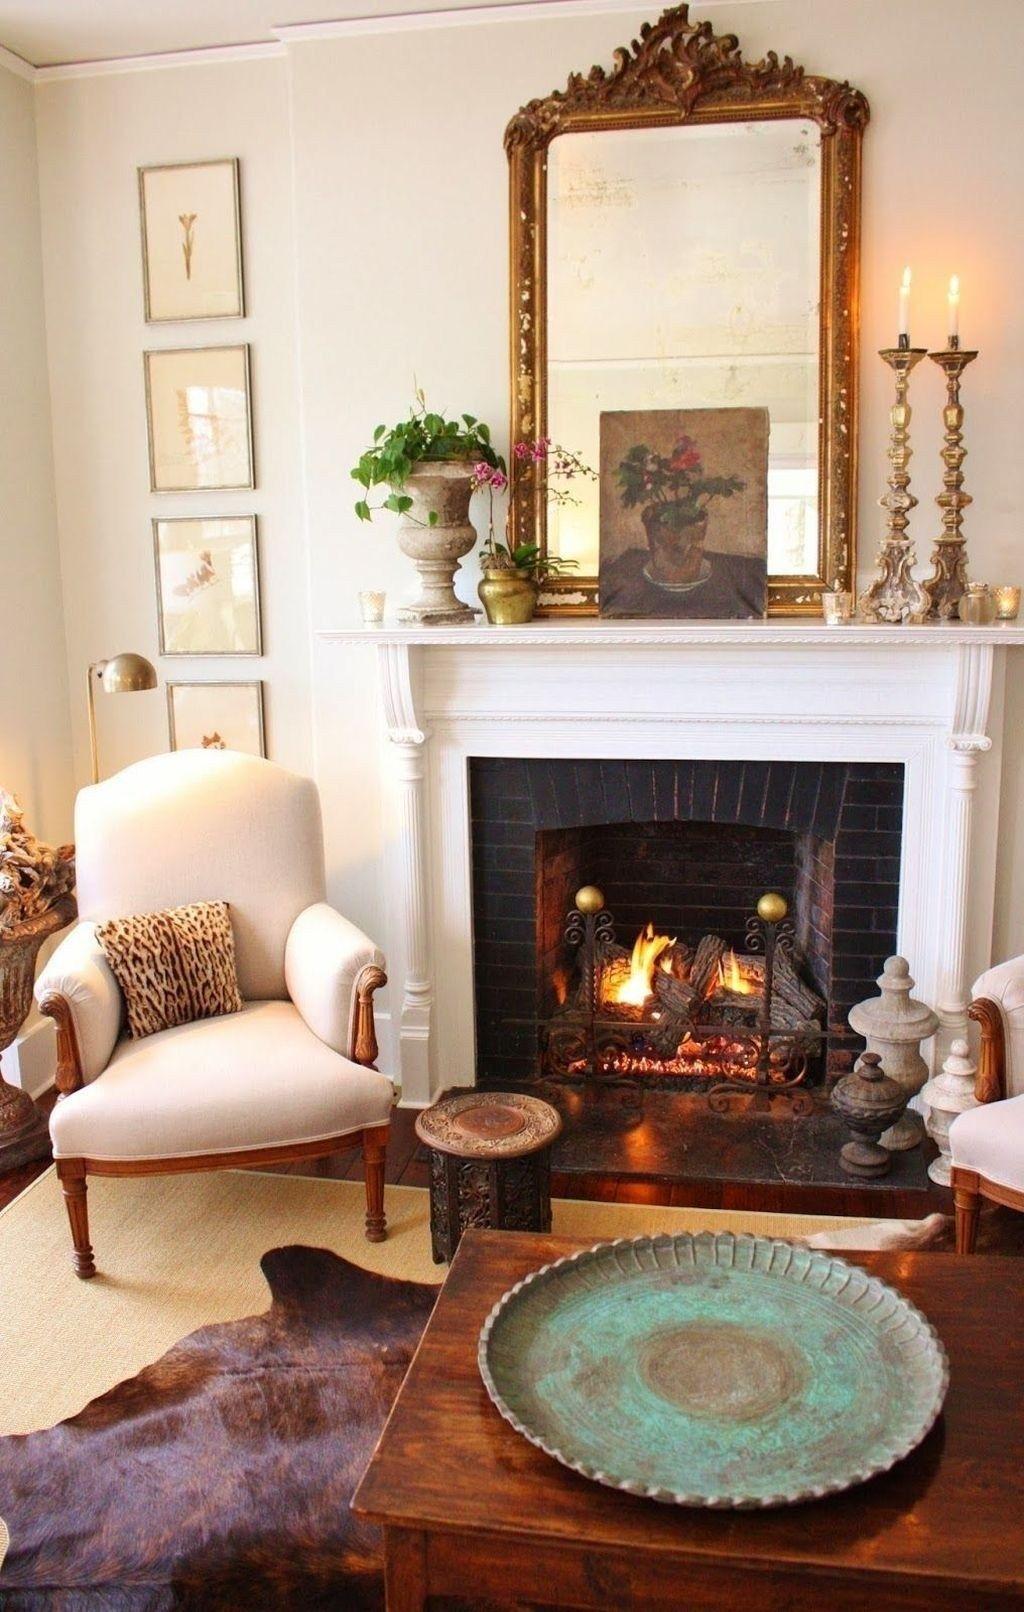 35+ rustic traditional living room design ideas - home decor & design | ev için